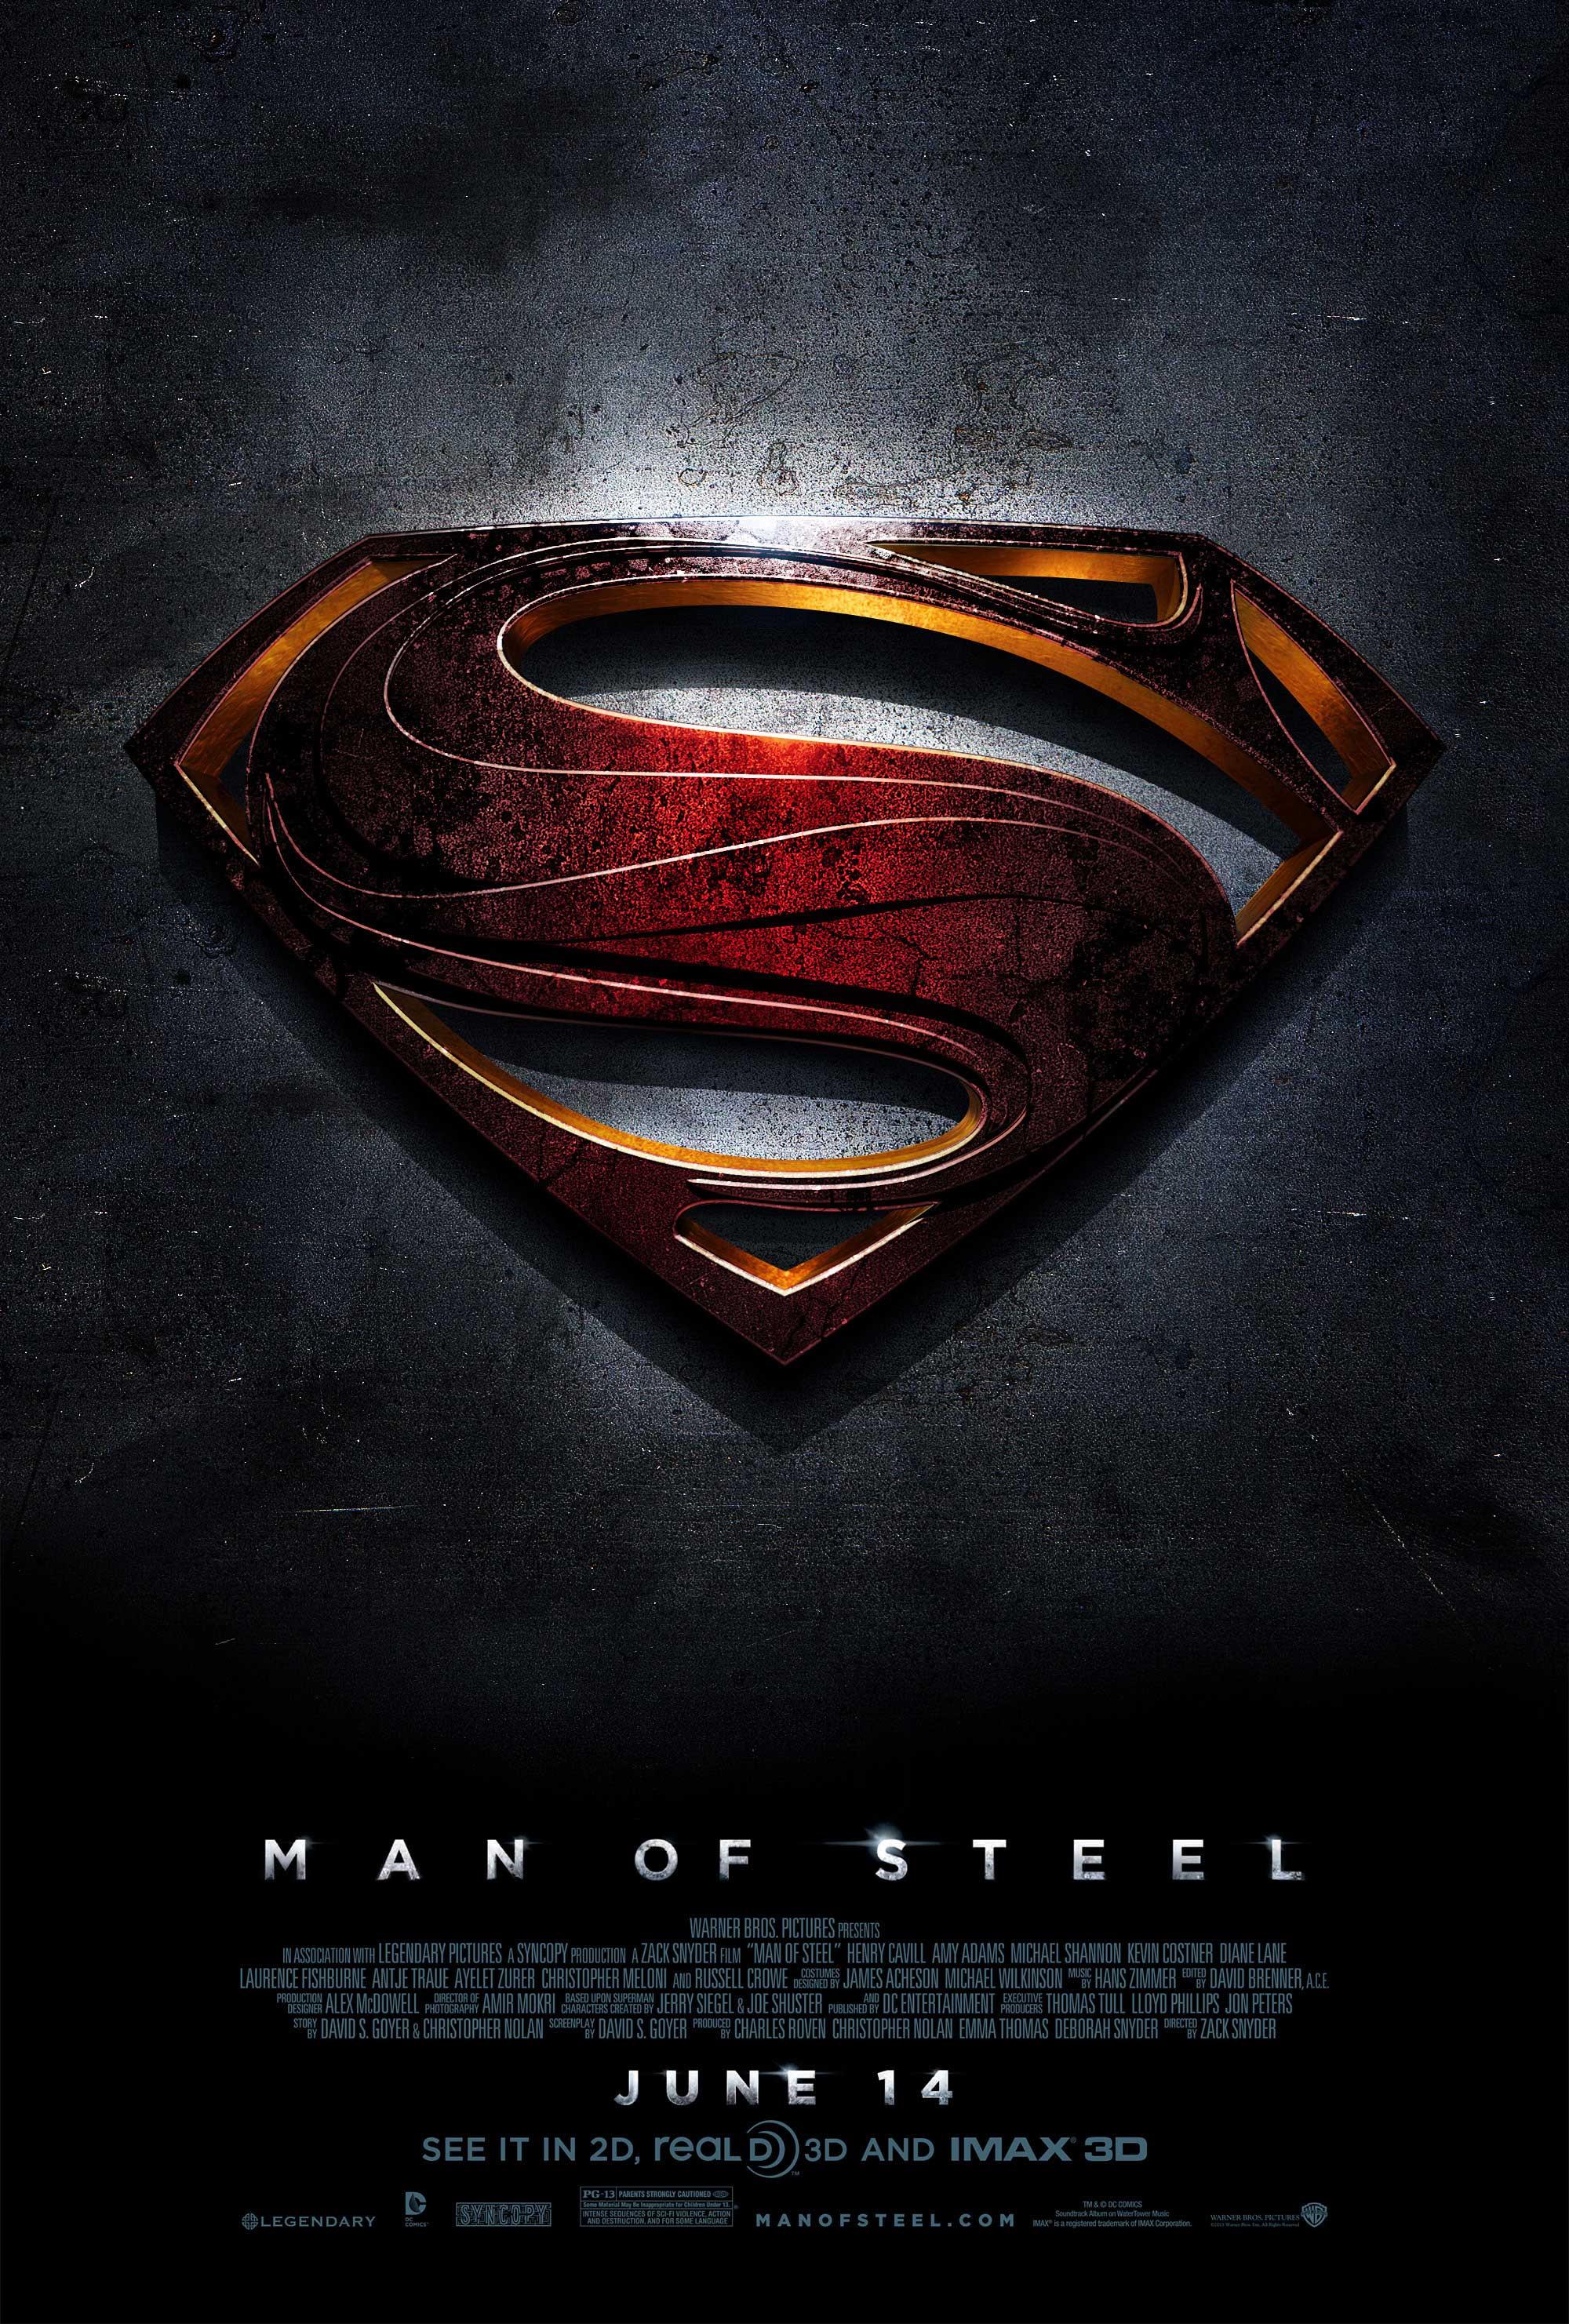 Superman: J.J. Abrams and Warner Bros. plan to reboot